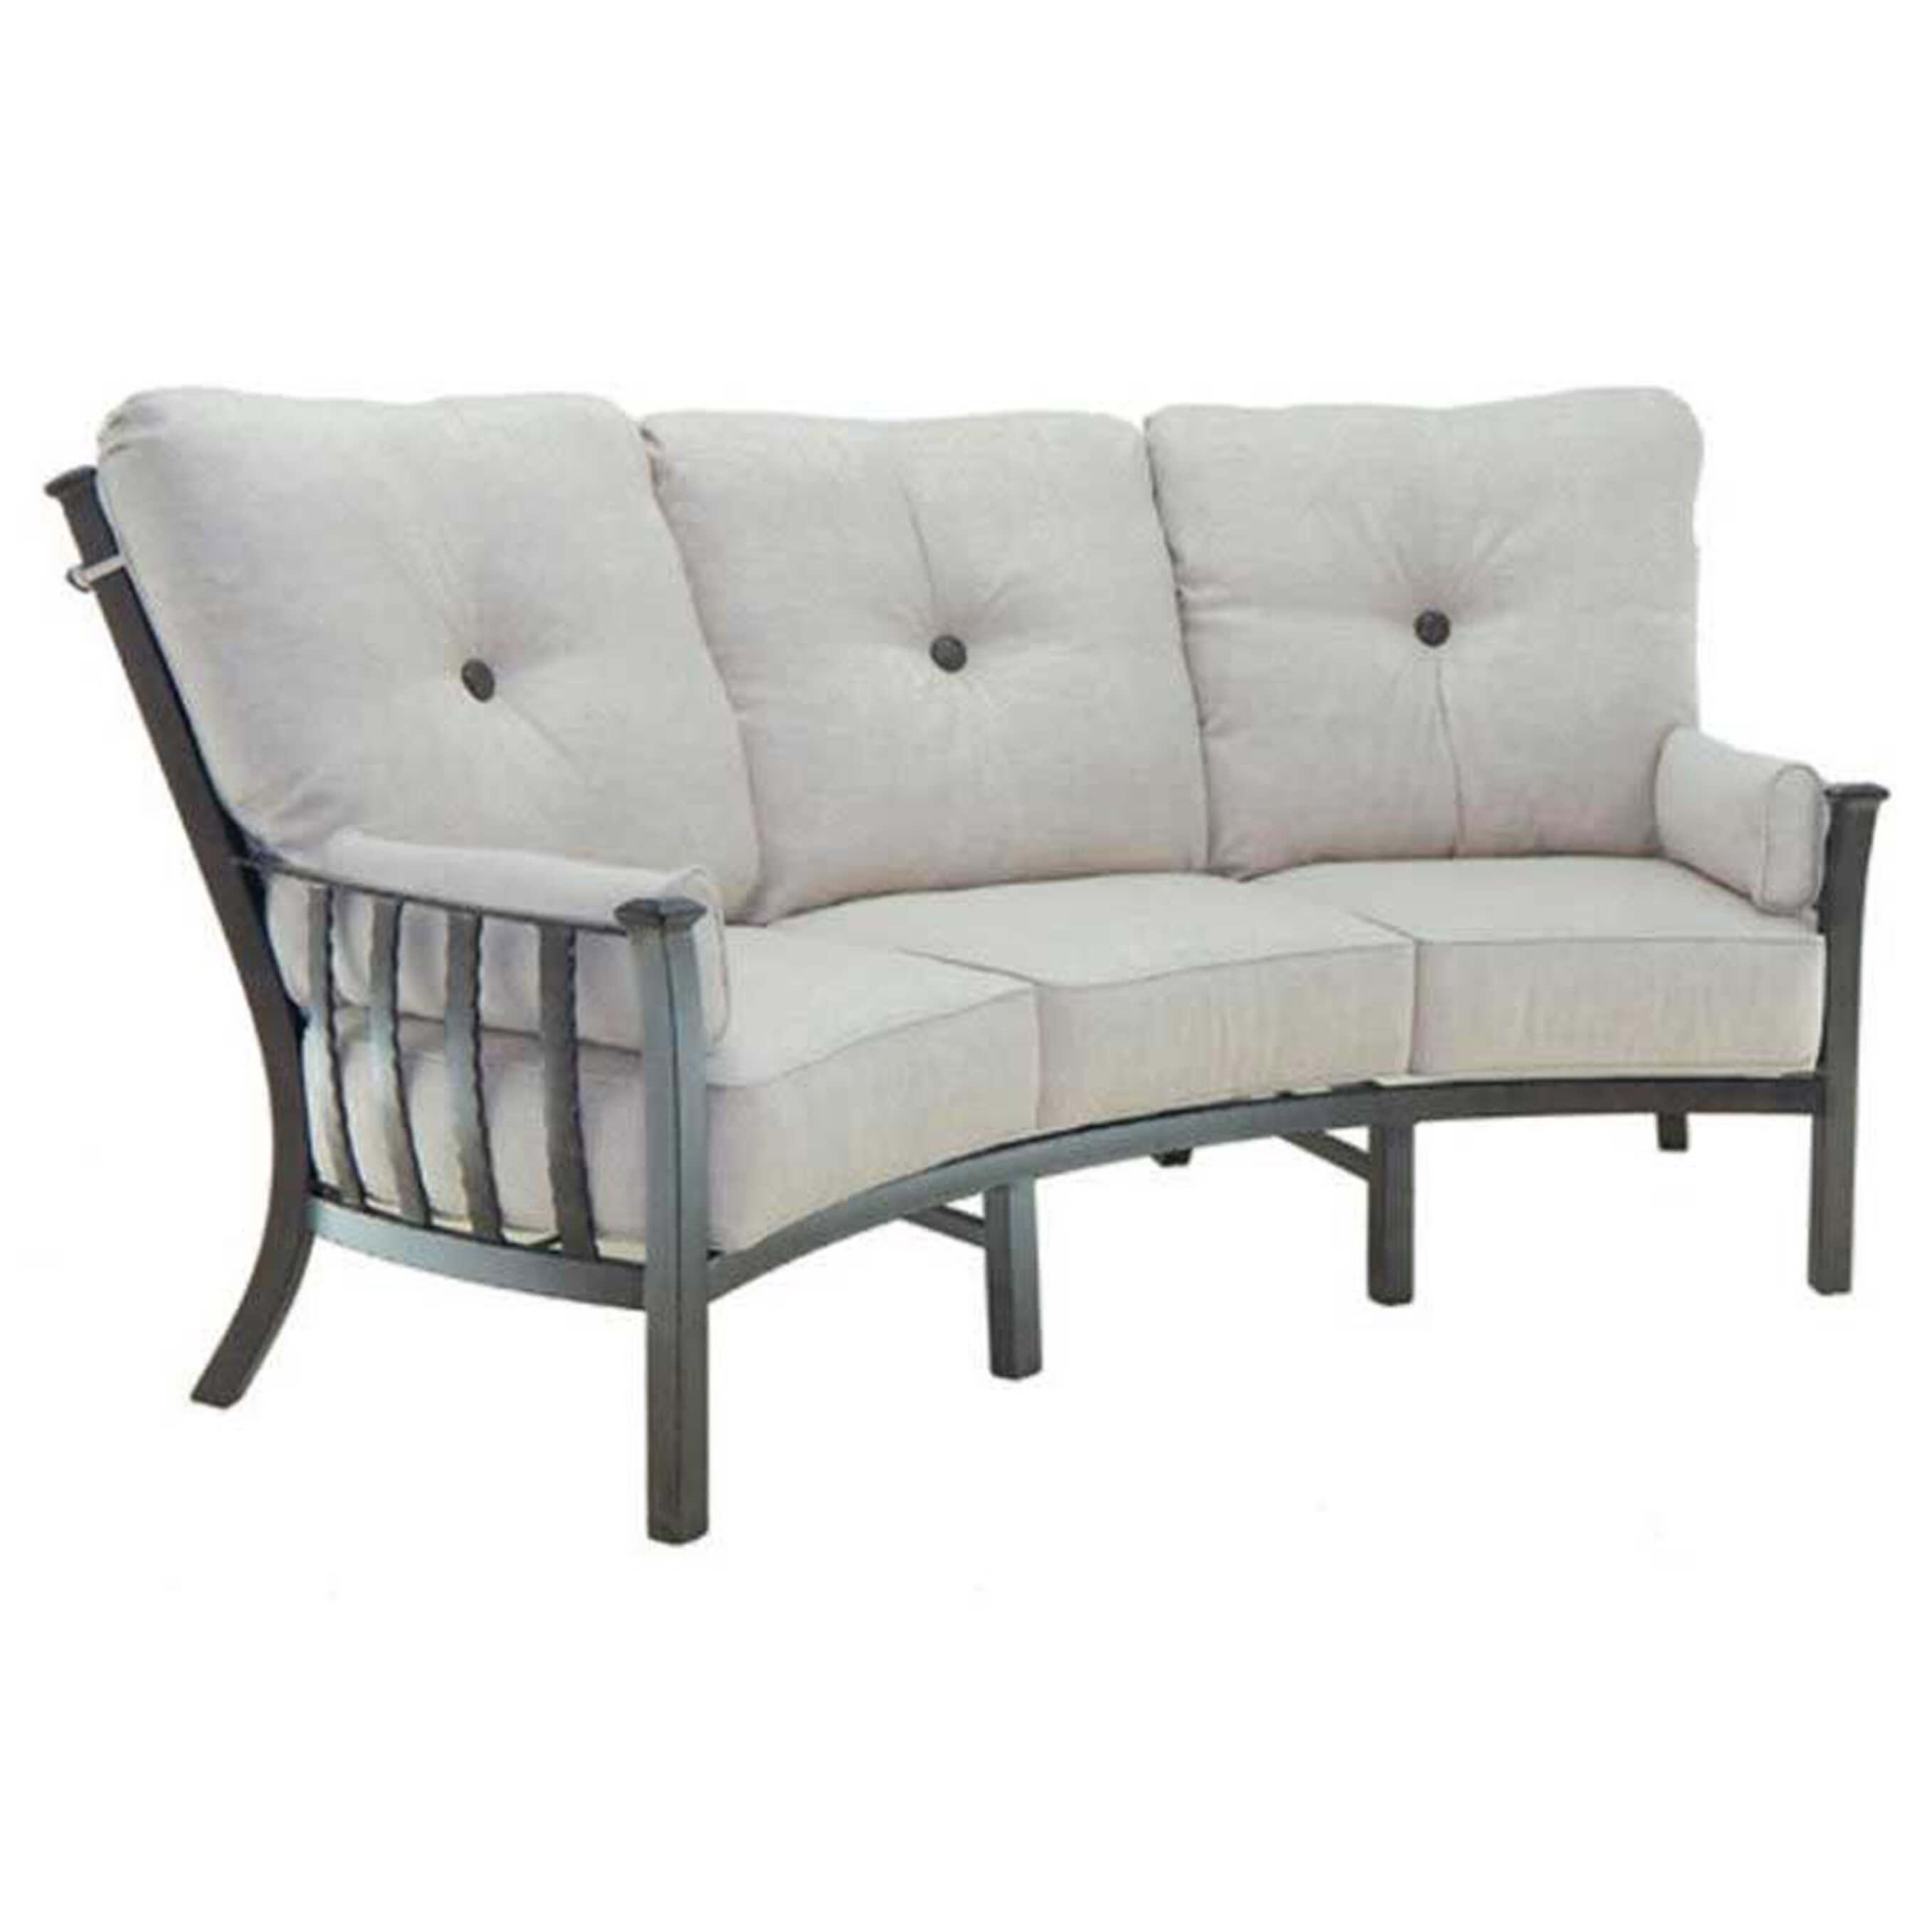 Santa Fe Cushion High Back Crescent Sofa